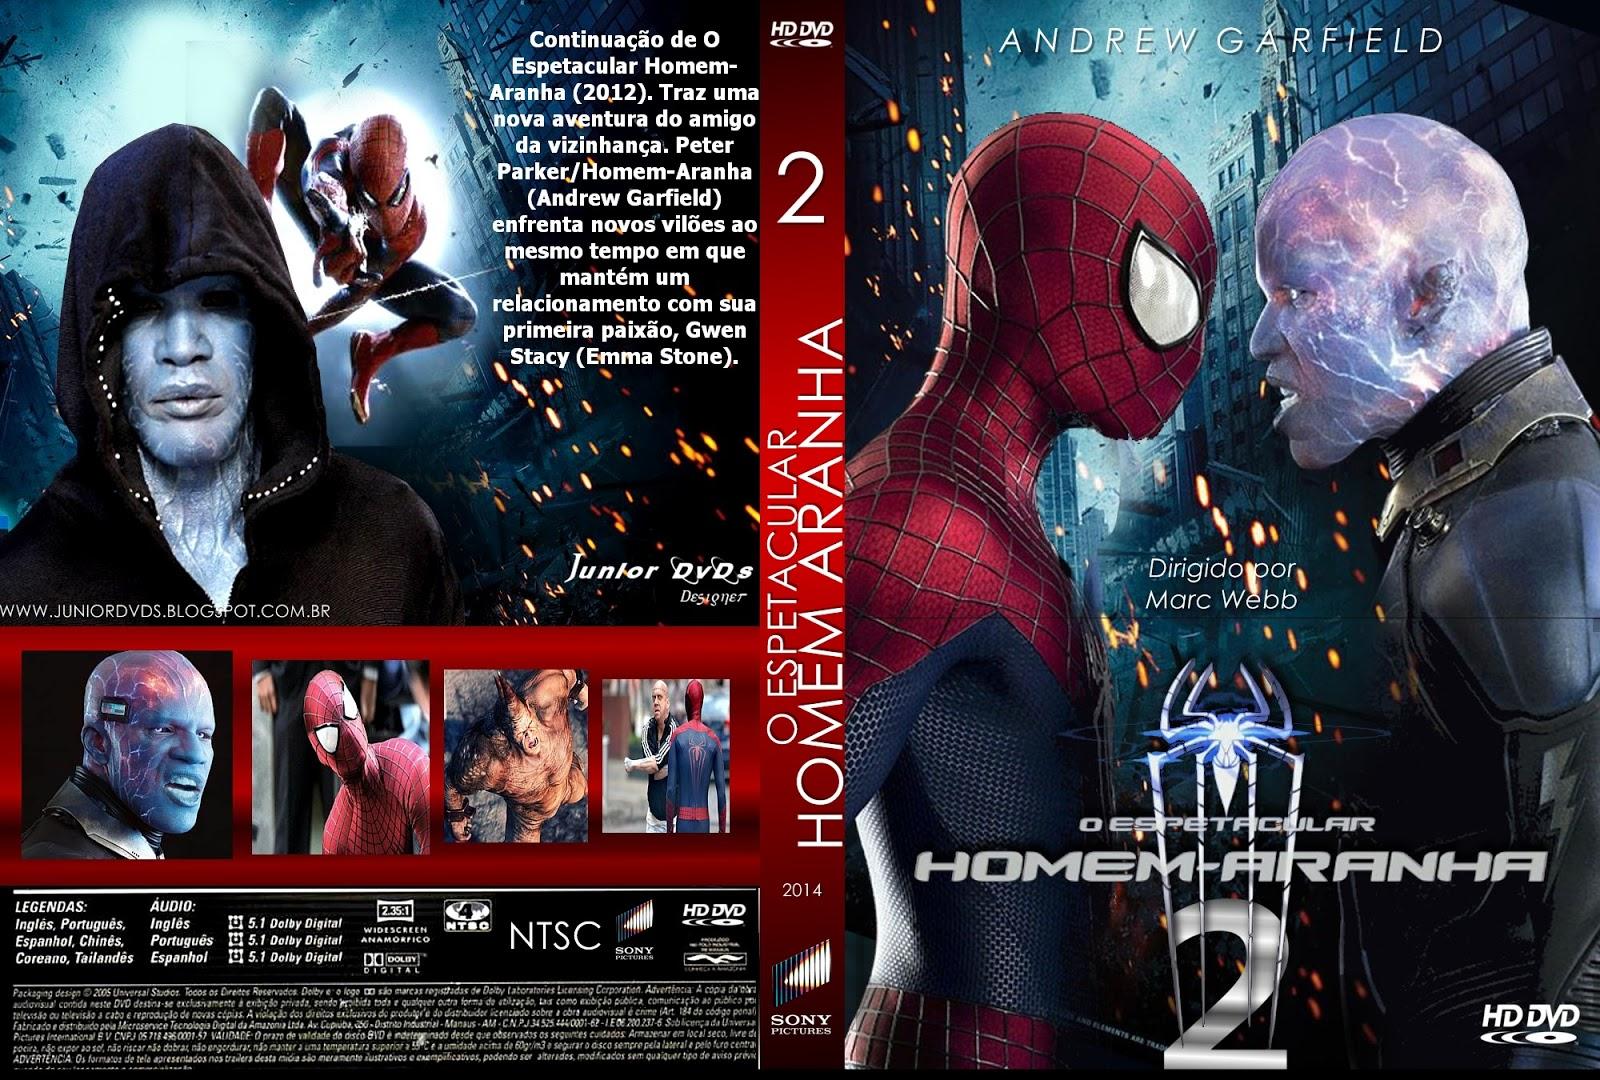 Download O Espetacular Homem-Aranha 2 R5 XviD Dual Áudio O ESPETACULAR HOMEN ARANHA 2 CAPA 2  JUNIOR DVDS DESIGNER